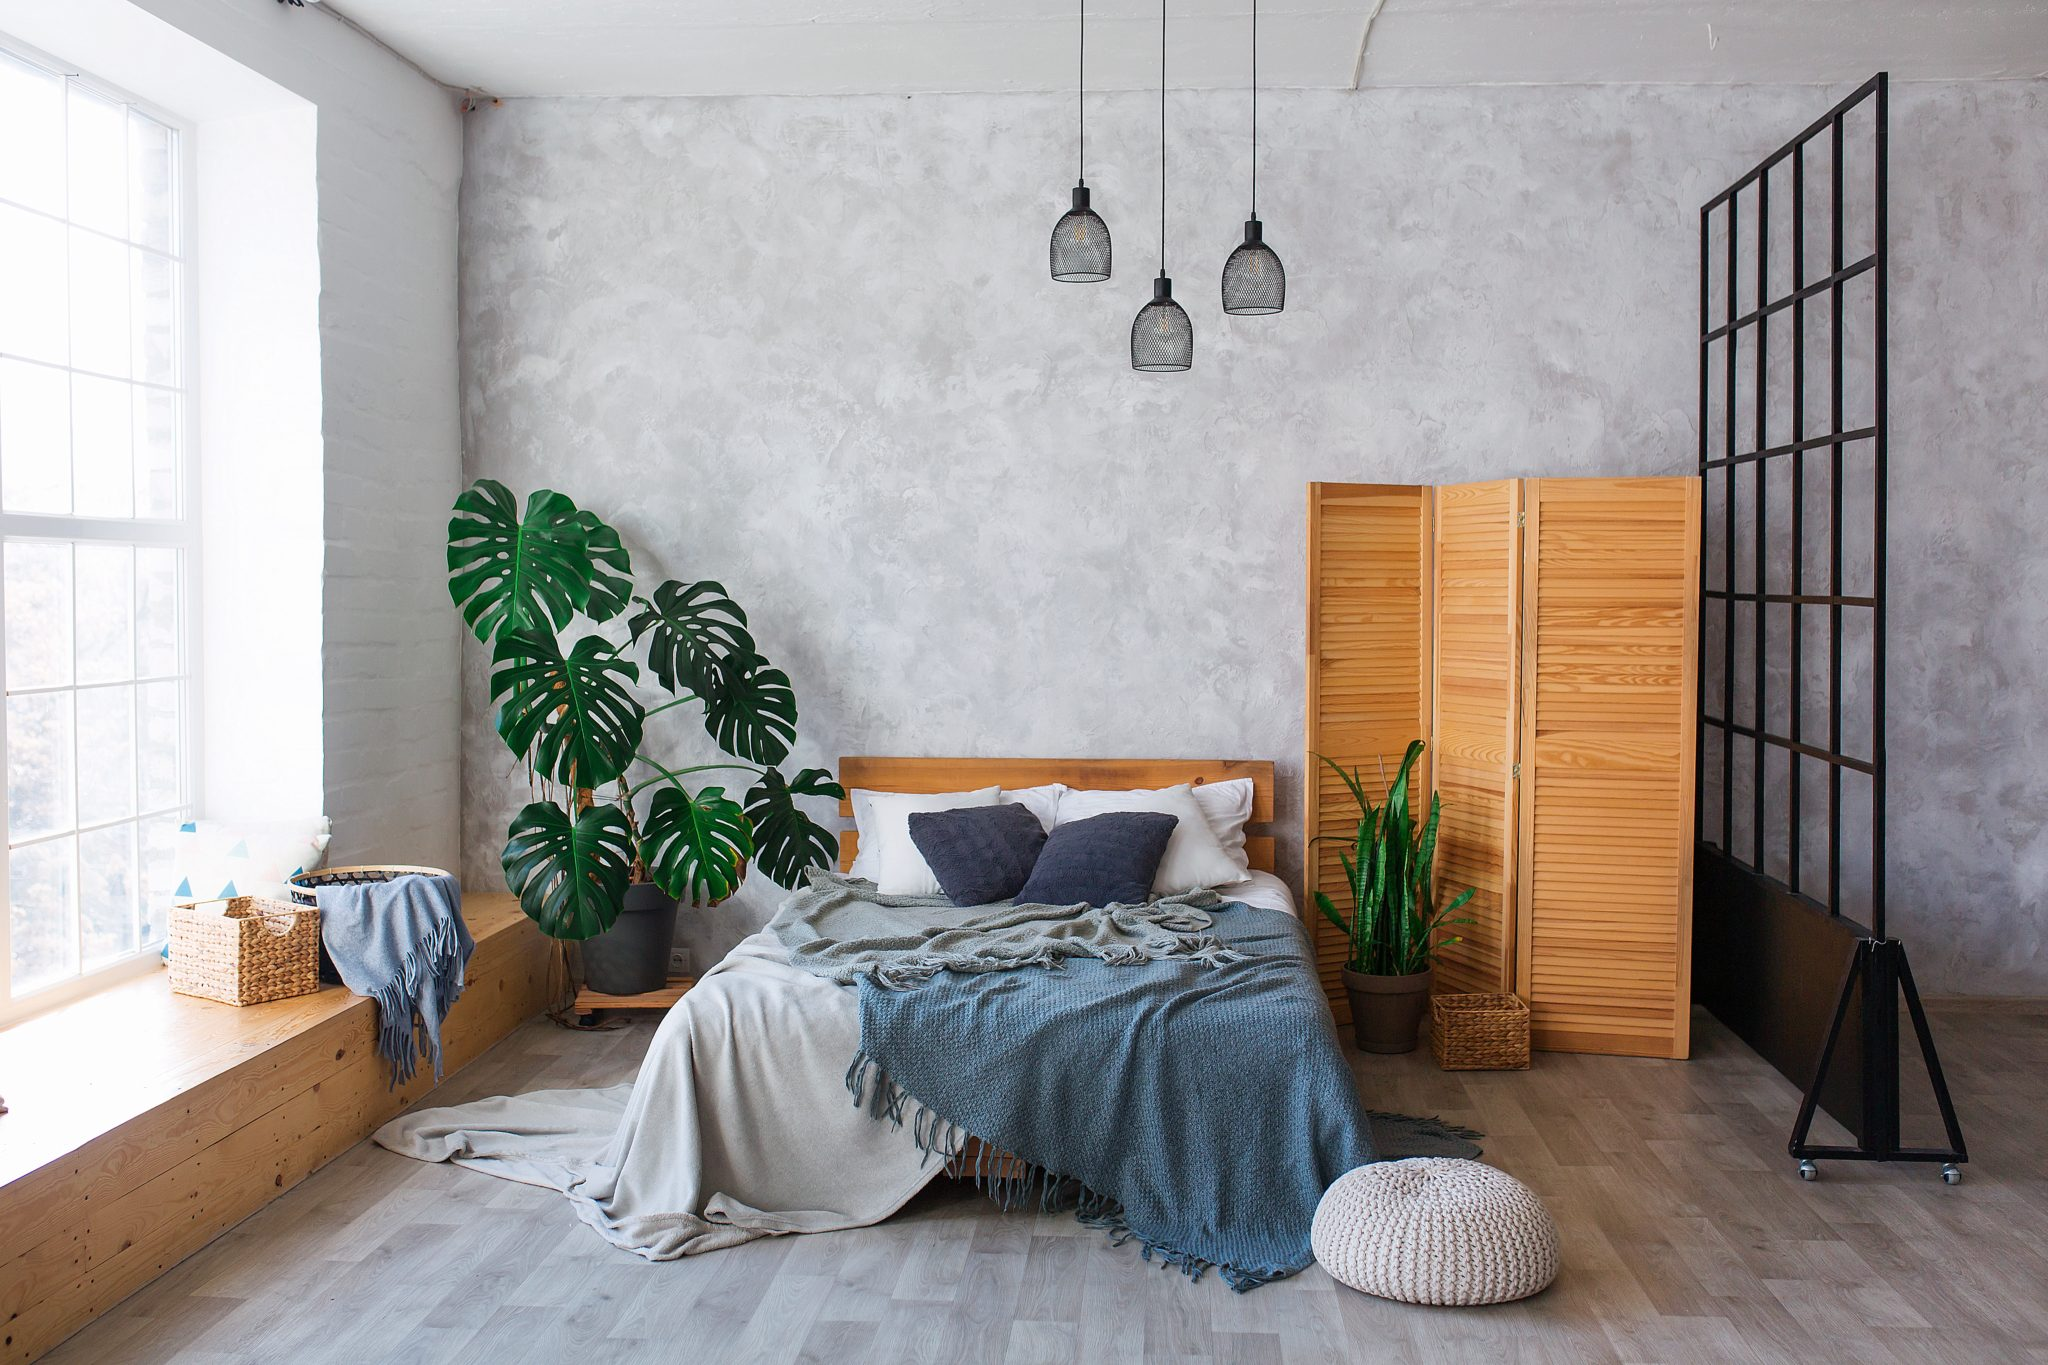 beton architektoniczny w sypialni